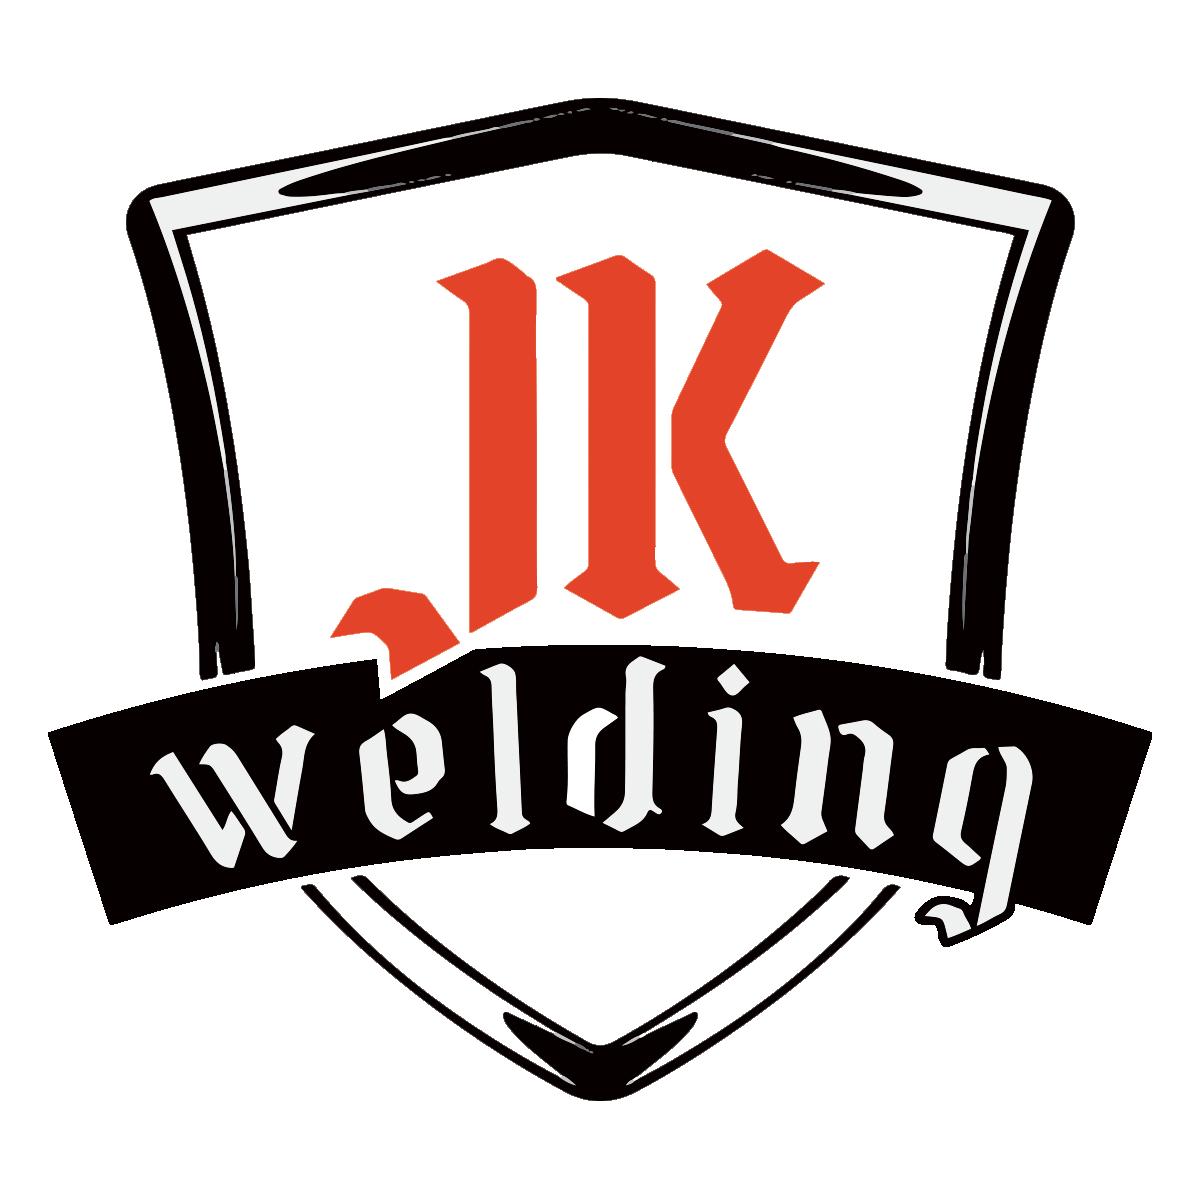 welding clipart metal fabrication